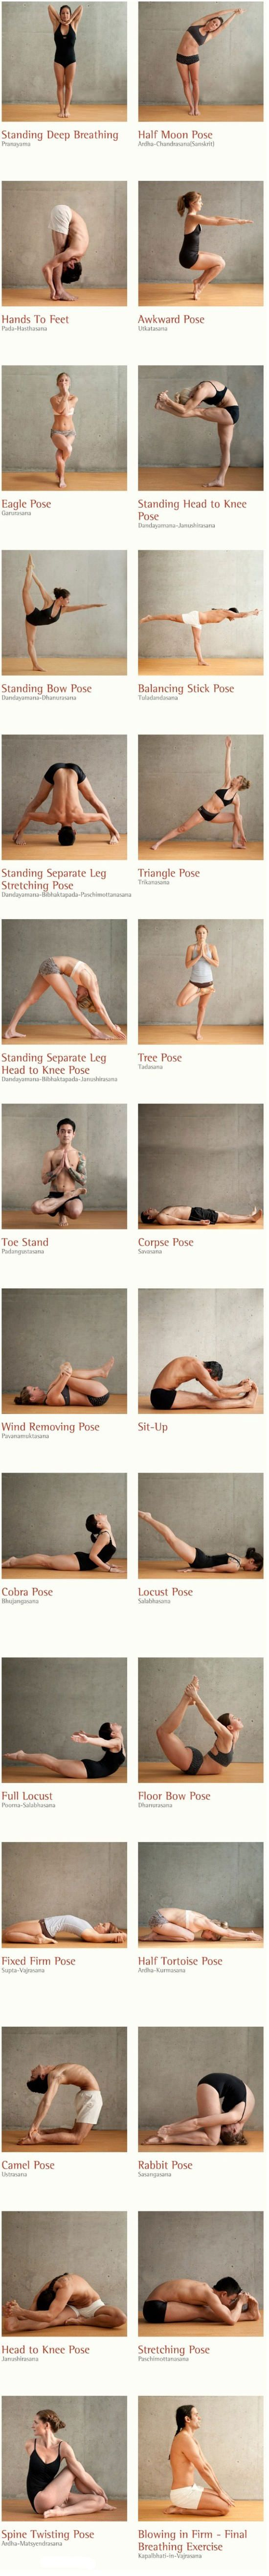 A useful chart of popular yoga poses